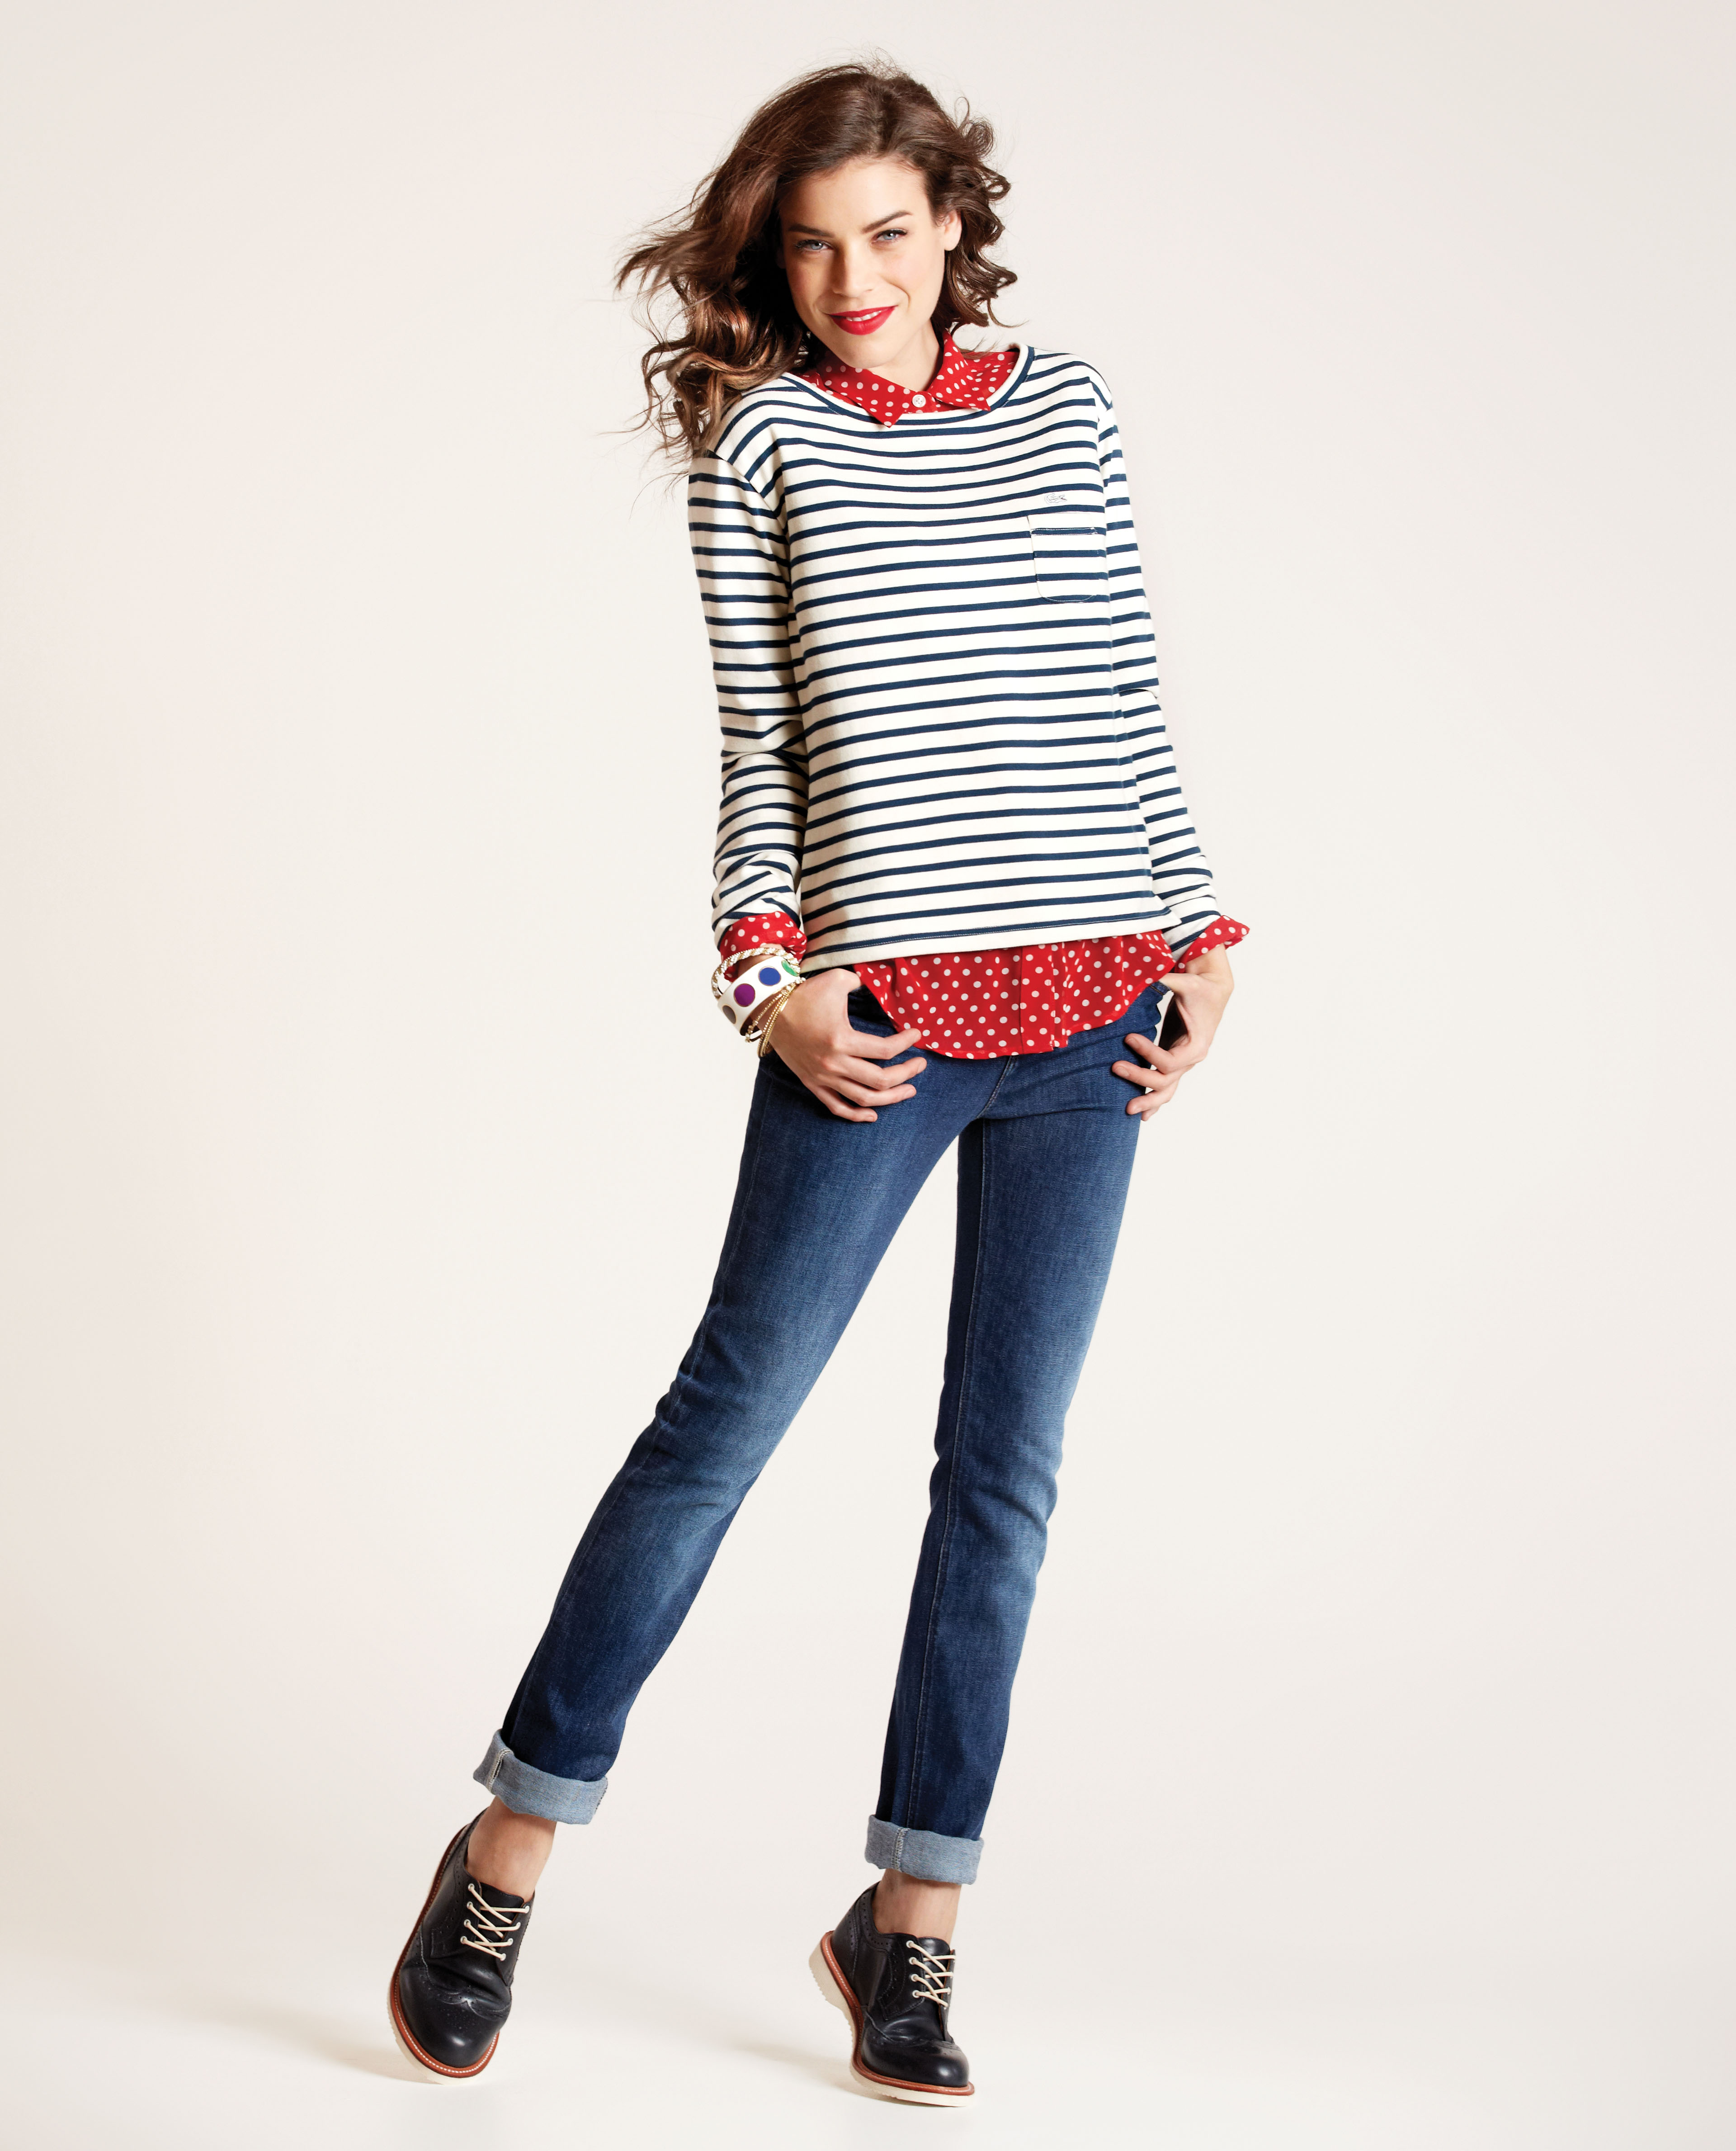 Jean style: Slim